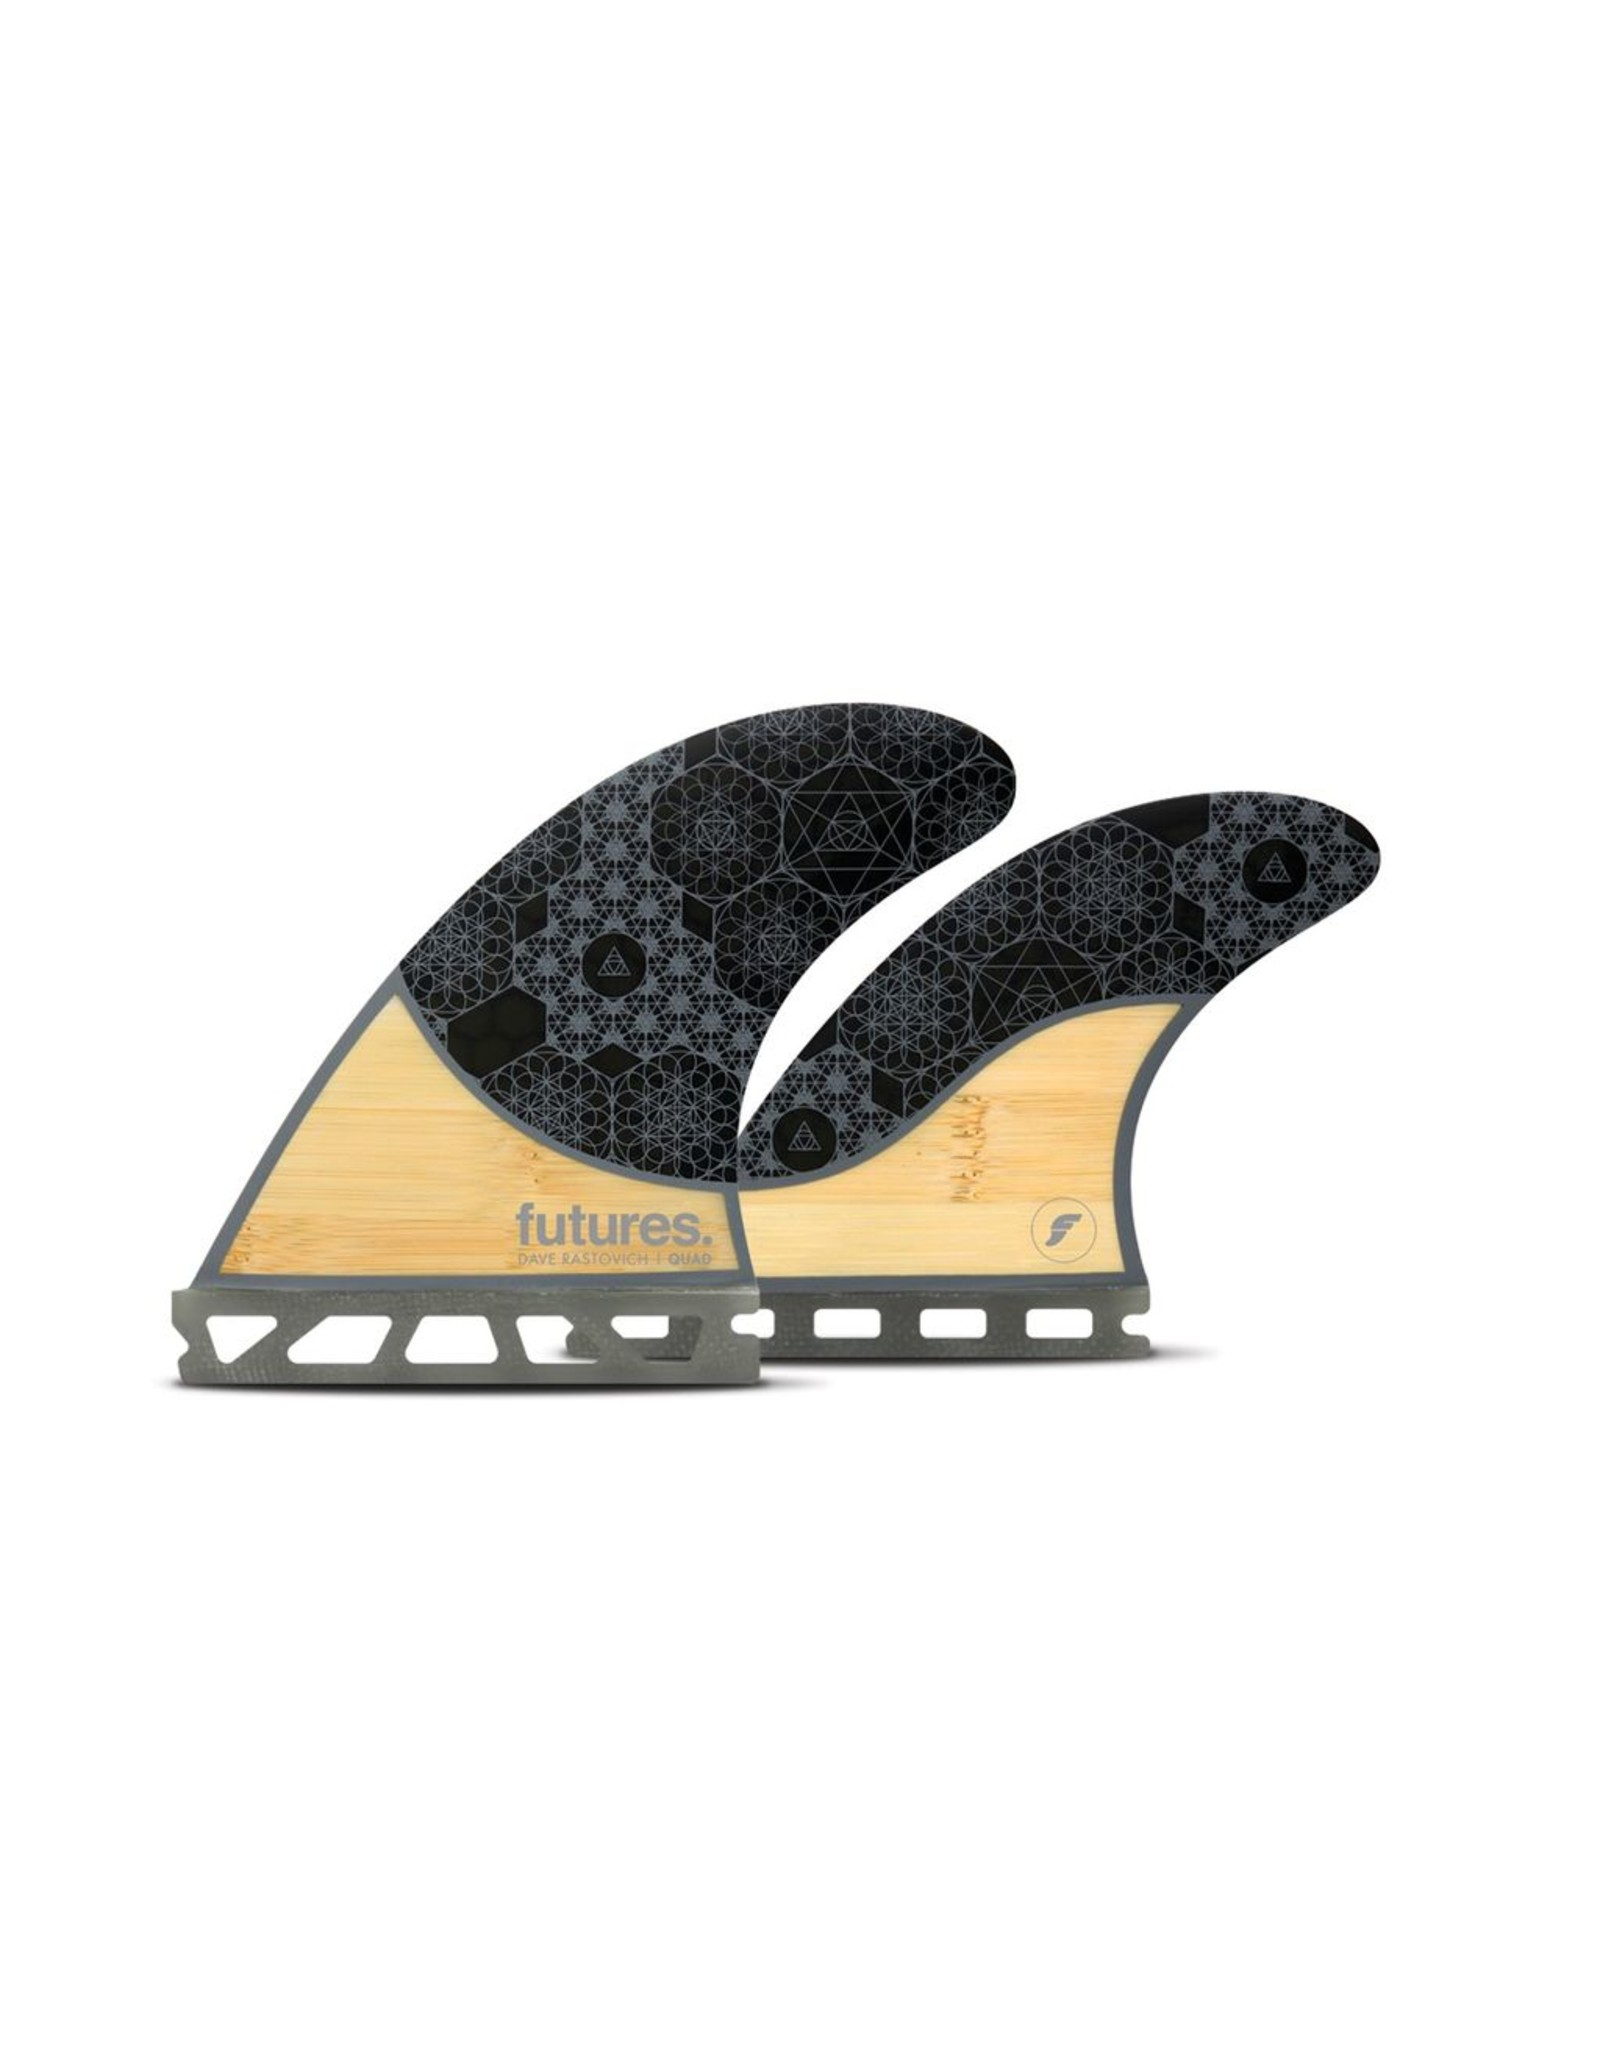 Future Fins Futures - RASTA QUAD Honeycomb - Bamboo/Grey - M (65kg - 88kg)